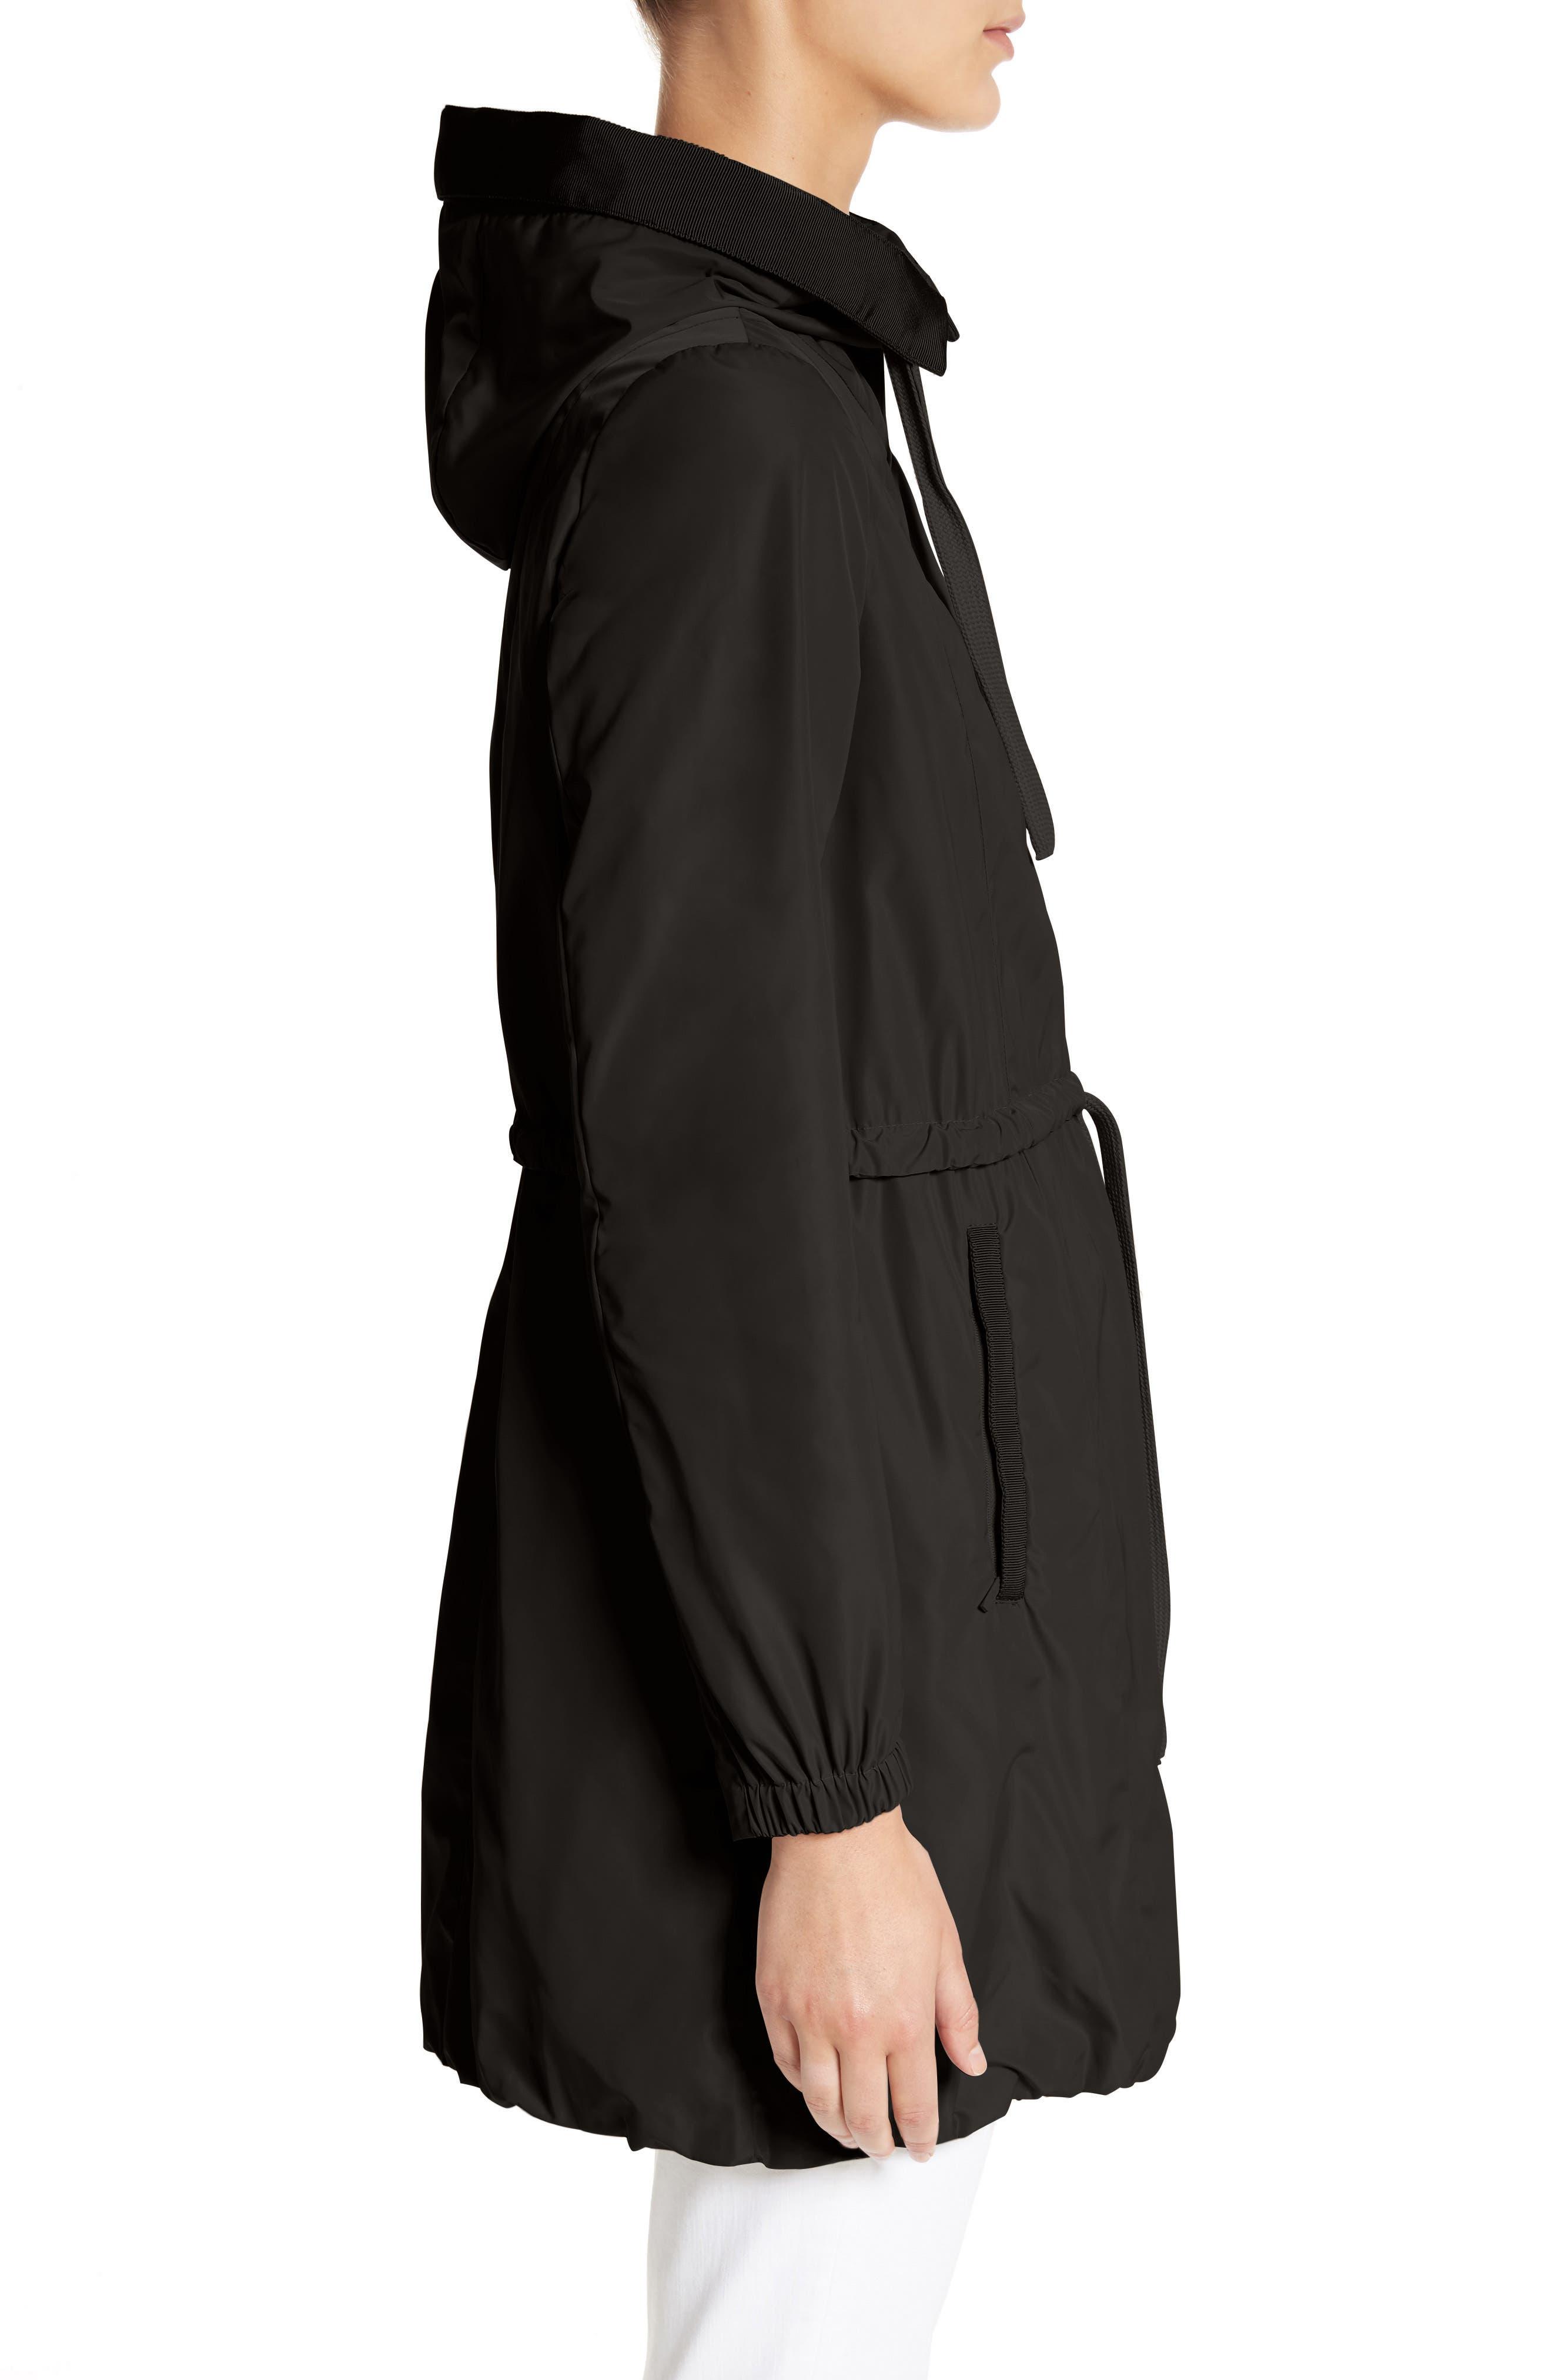 Topaze Water Resistant Hooded Jacket,                             Alternate thumbnail 3, color,                             BLACK